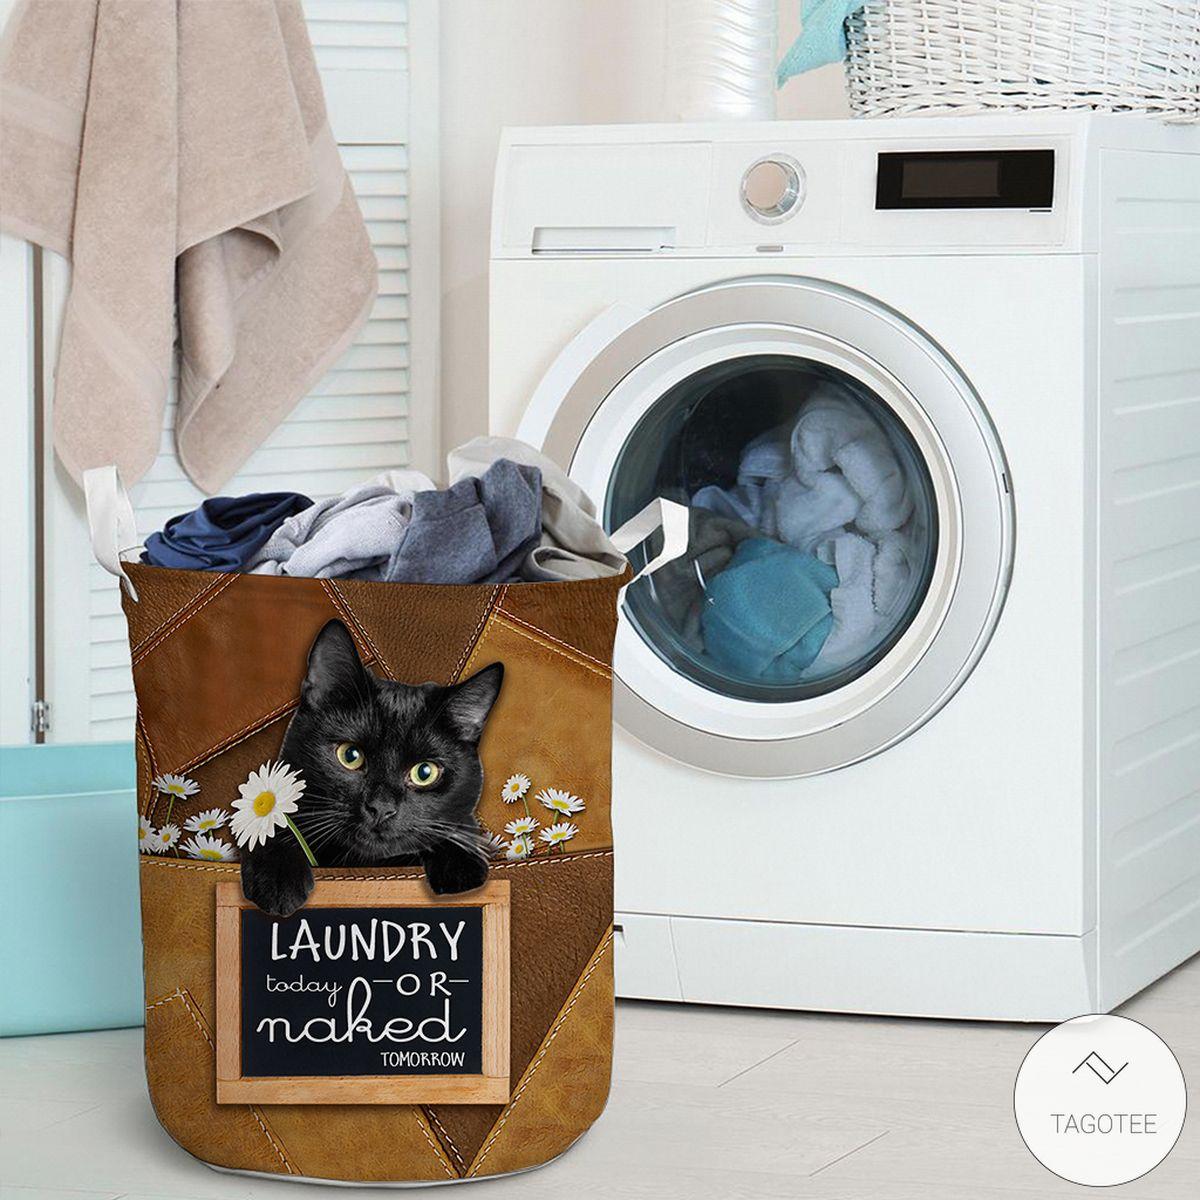 Black Cat Laundry Today Or Naked Tomorrow Laundry Basketz